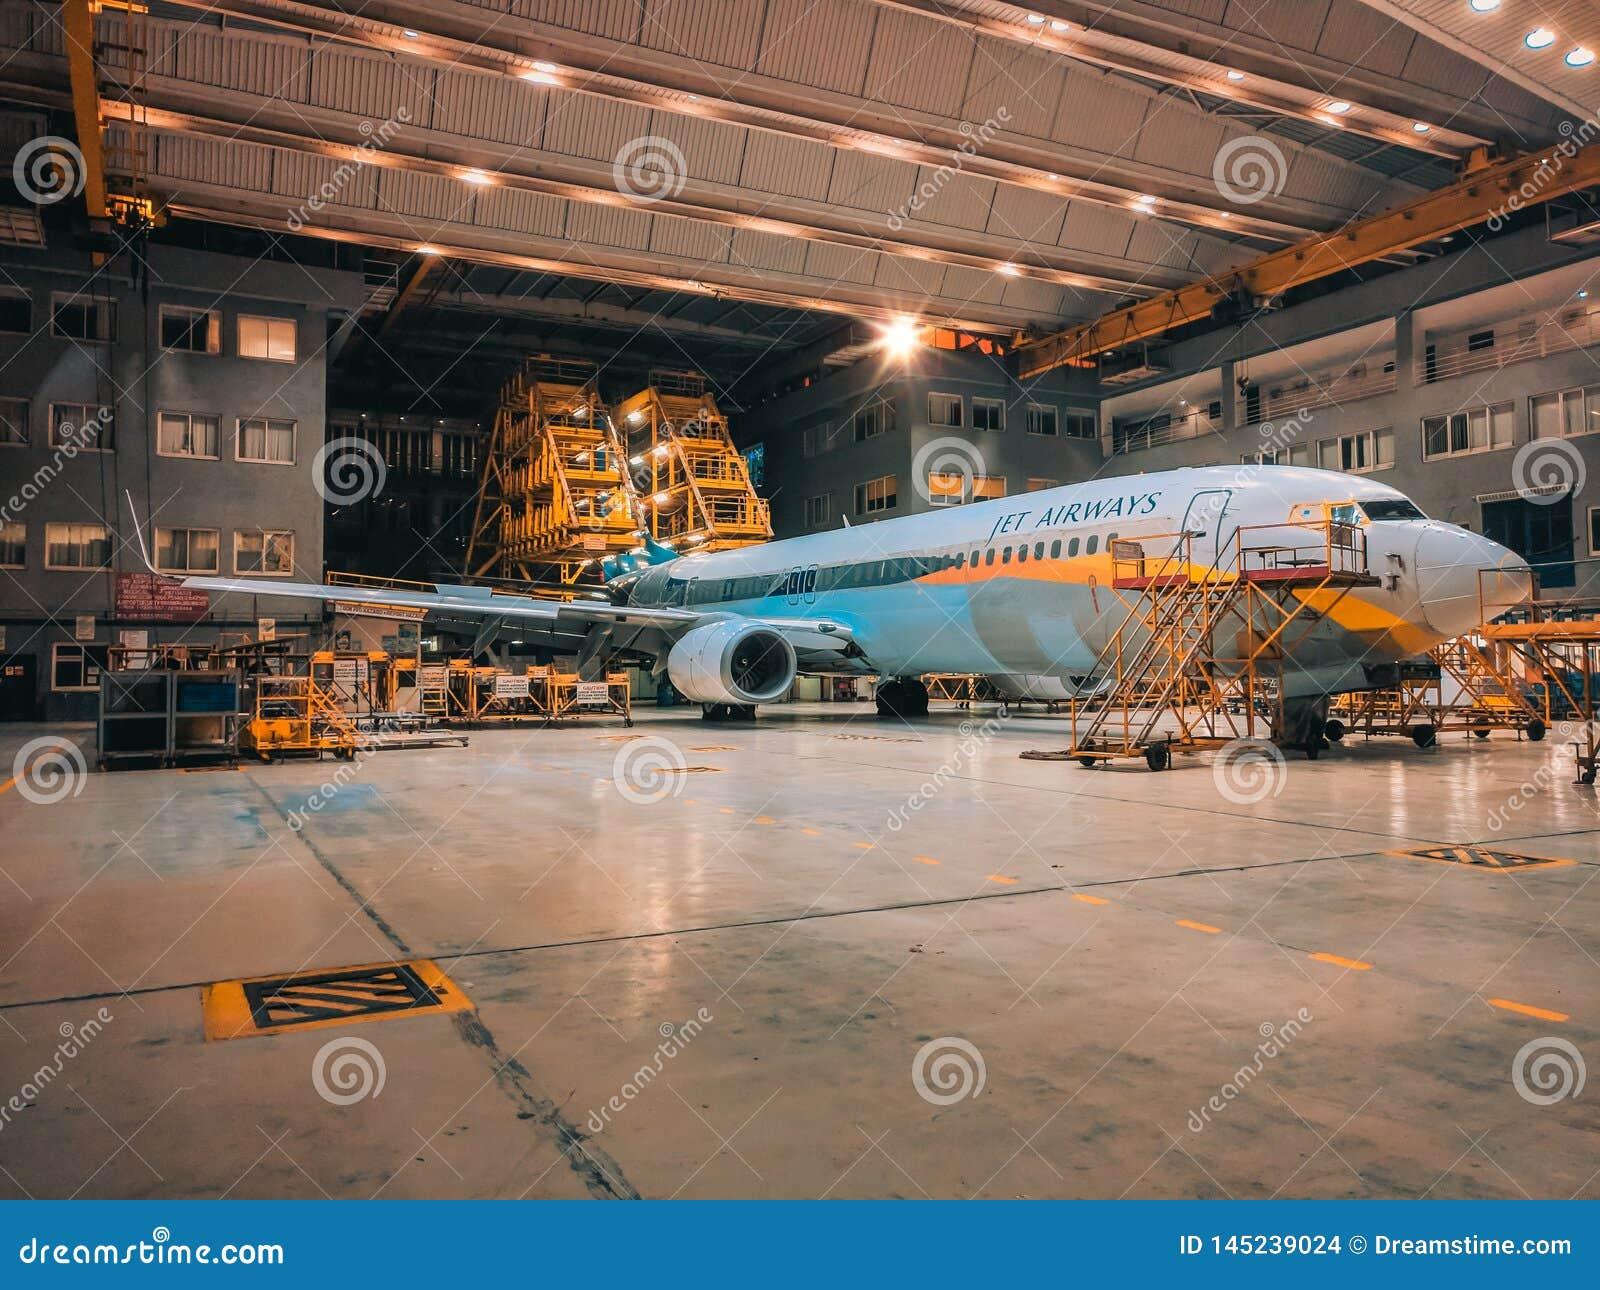 Jet Airways Plane In Hangar